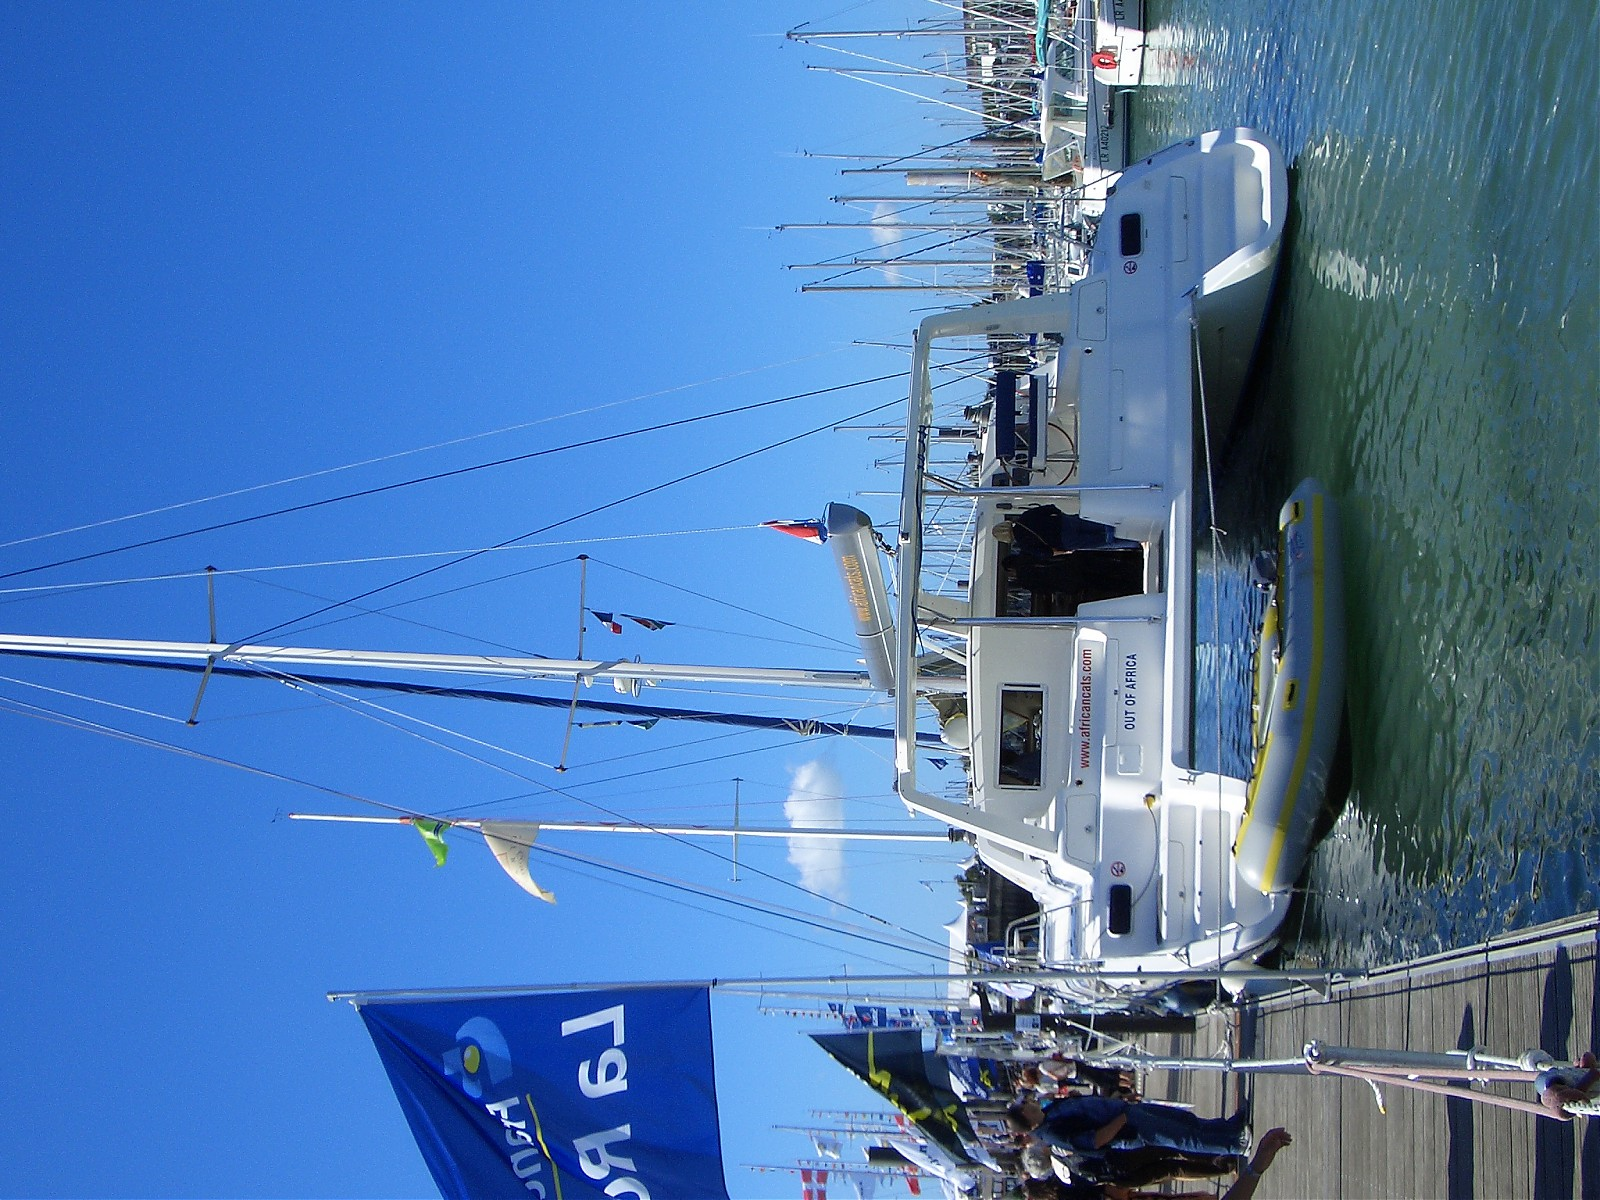 Click image for larger version  Name:La Rochelle - IJmuiden 2 056.jpg Views:88 Size:518.8 KB ID:4671